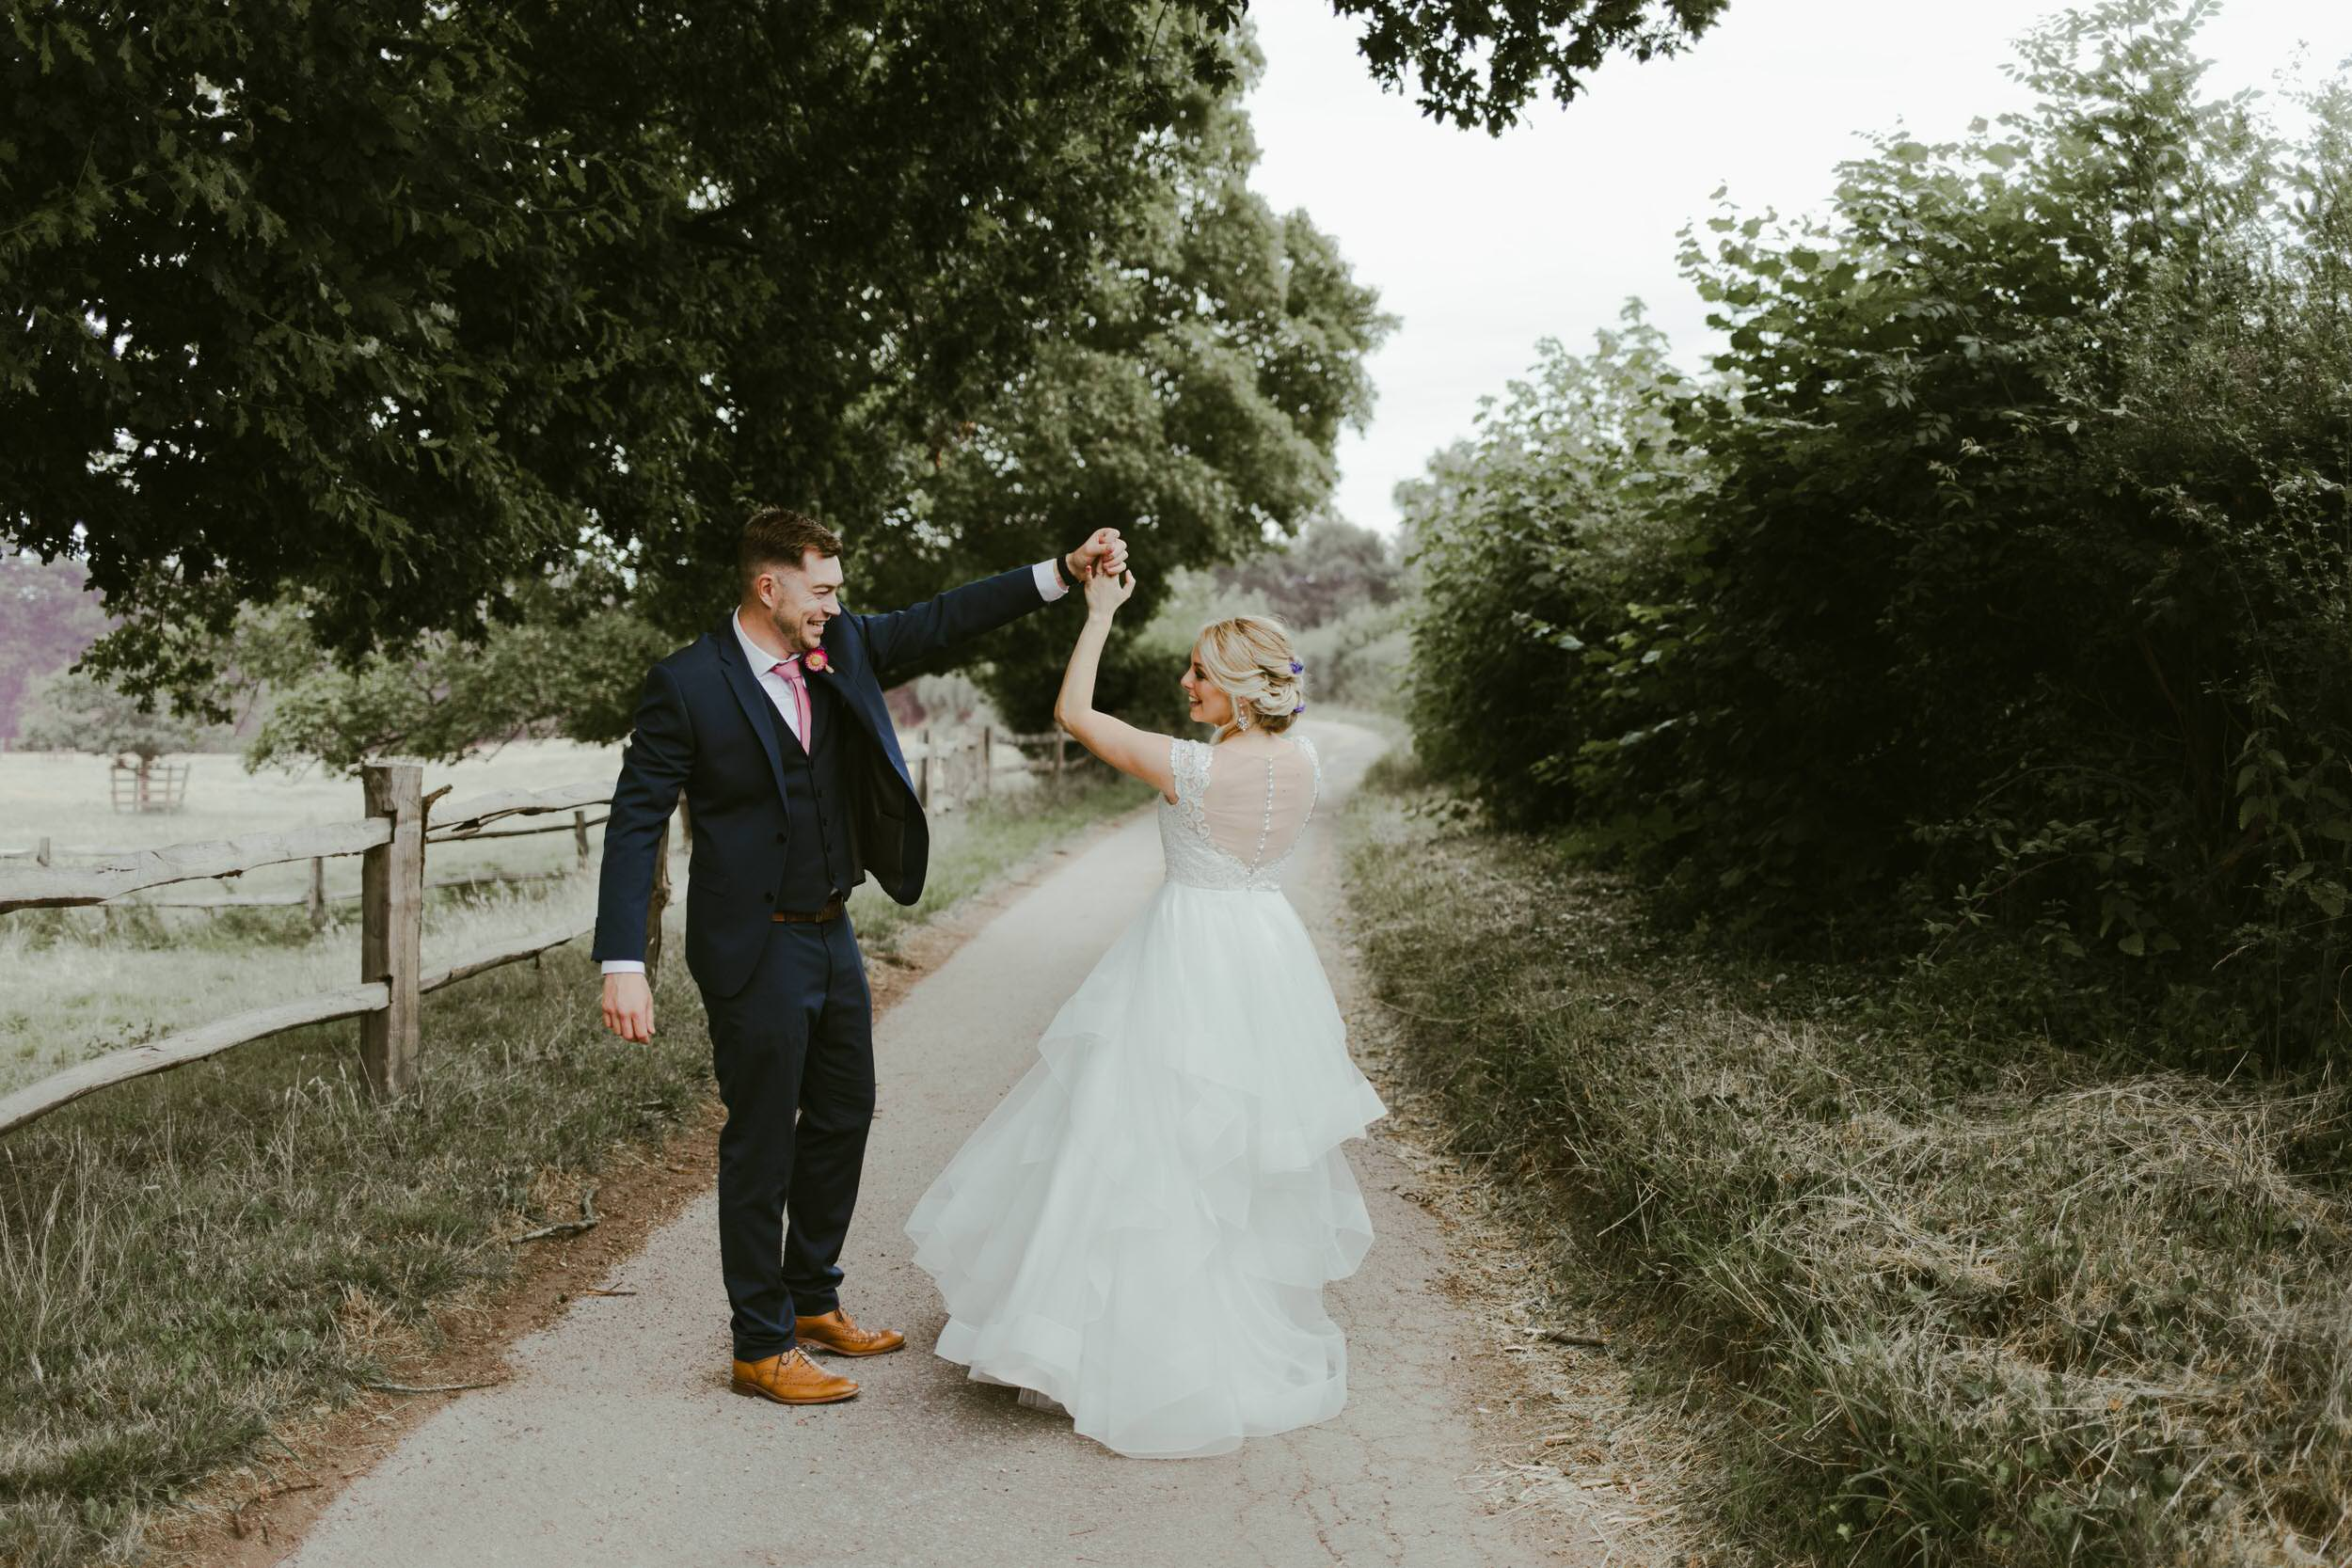 gate-street-barn-wedding-photography-photographer-surrey-uk-summer-weddings-country